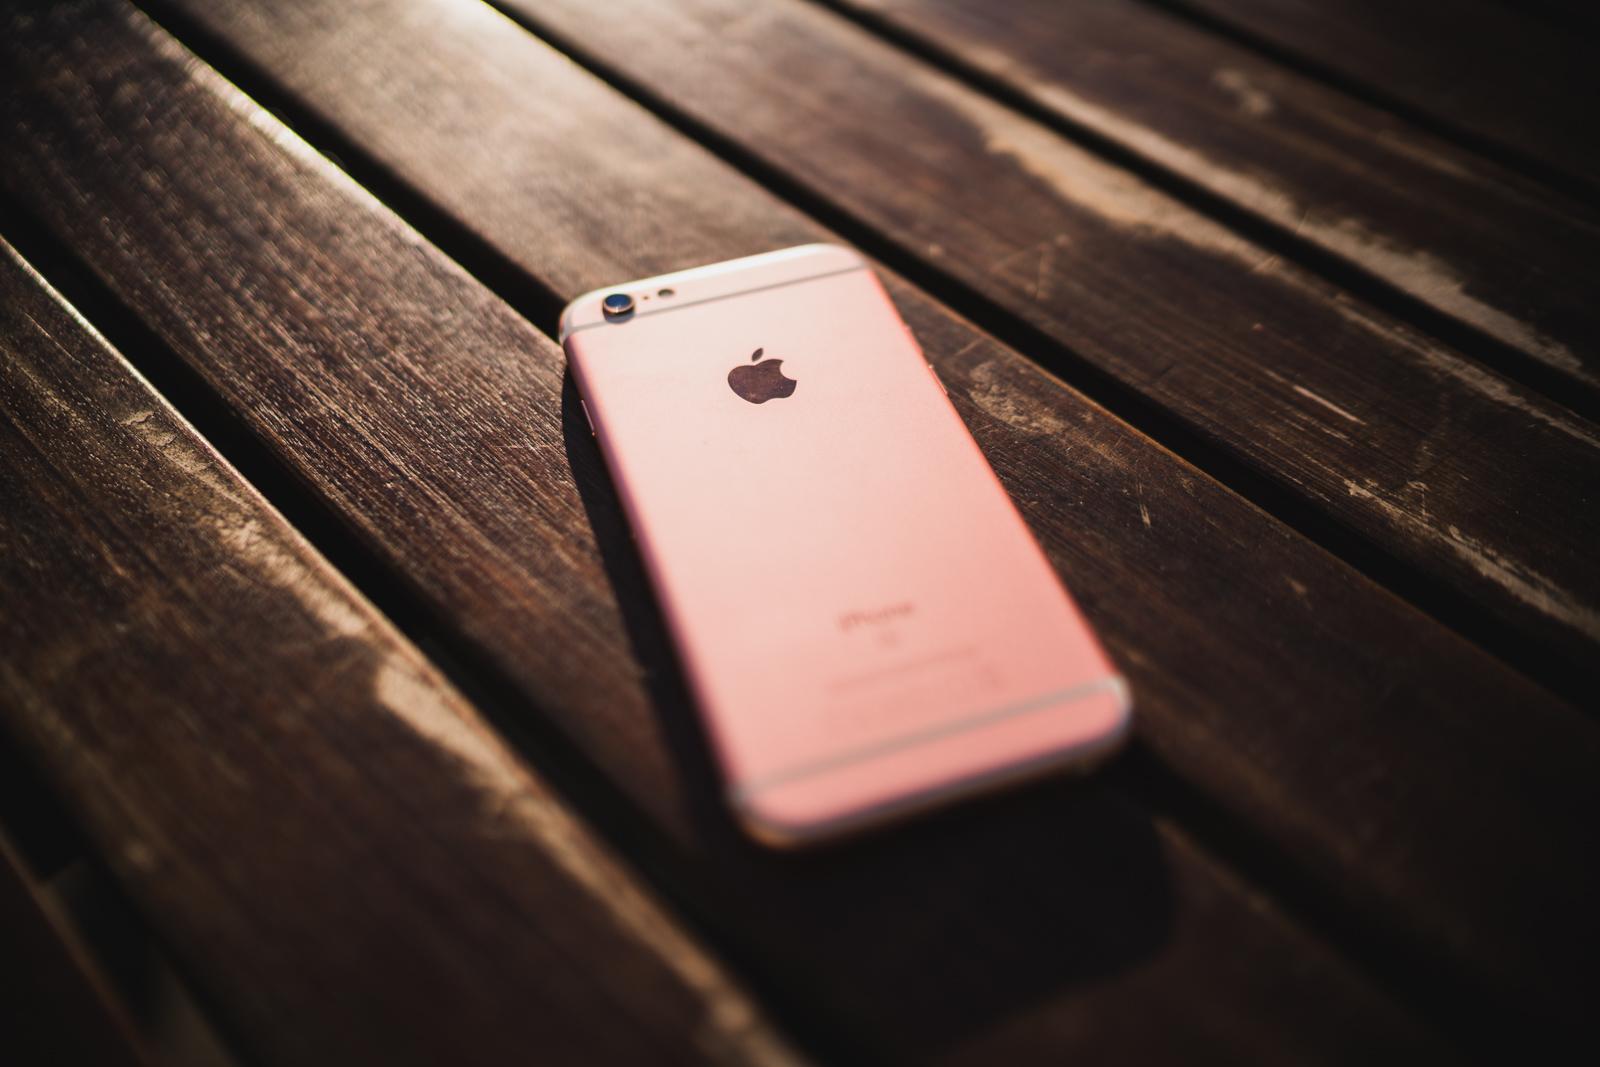 iphone-6s-016